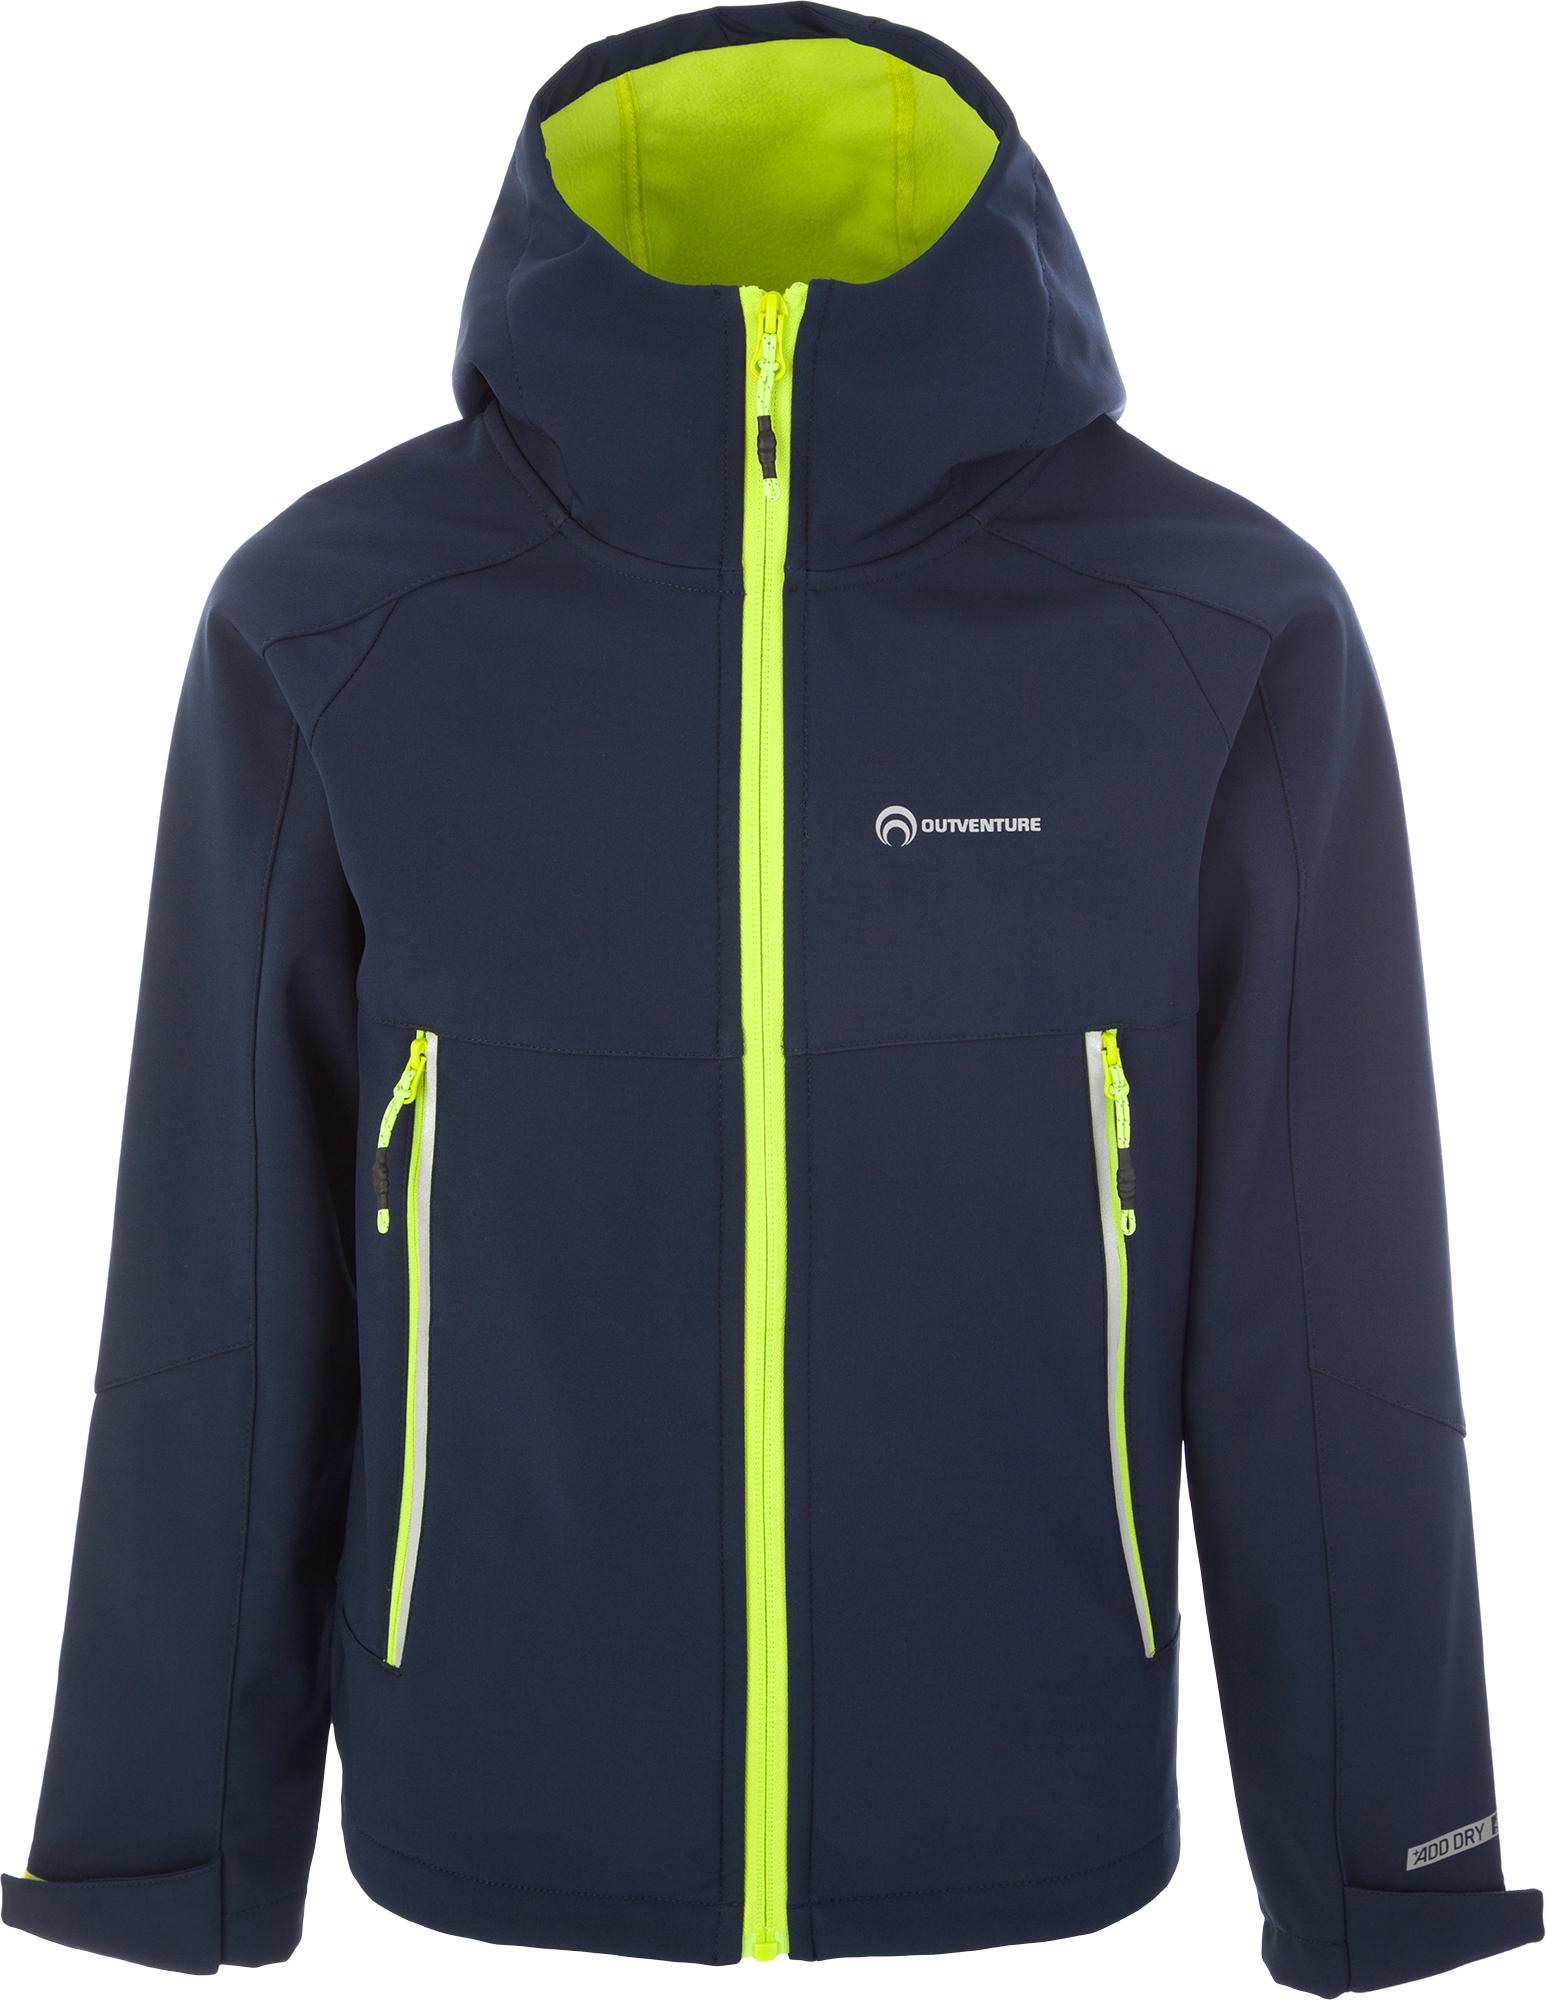 Outventure Куртка софт-шелл для мальчиков Outventure, размер 164